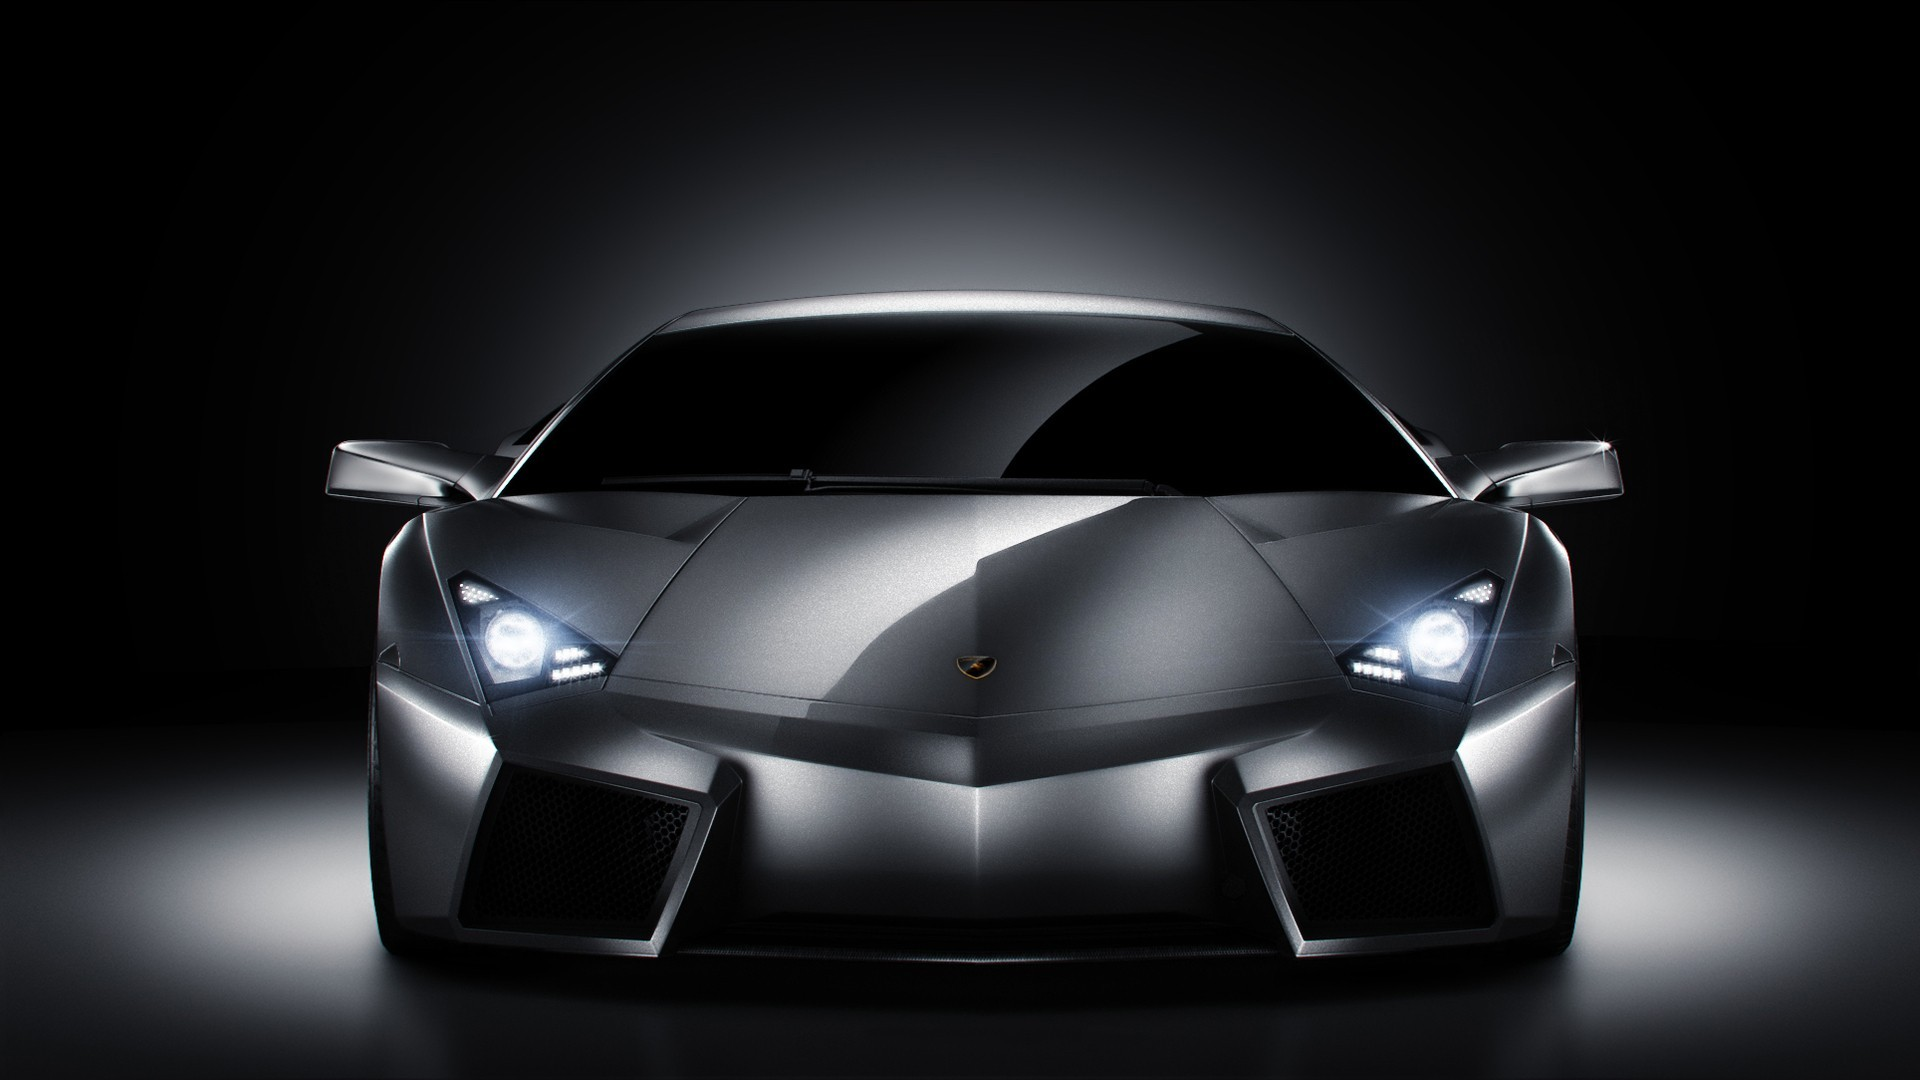 Lamborghini Reventon Hd Wallpaper 4975 Hd Wallpapers in Cars 1920x1080